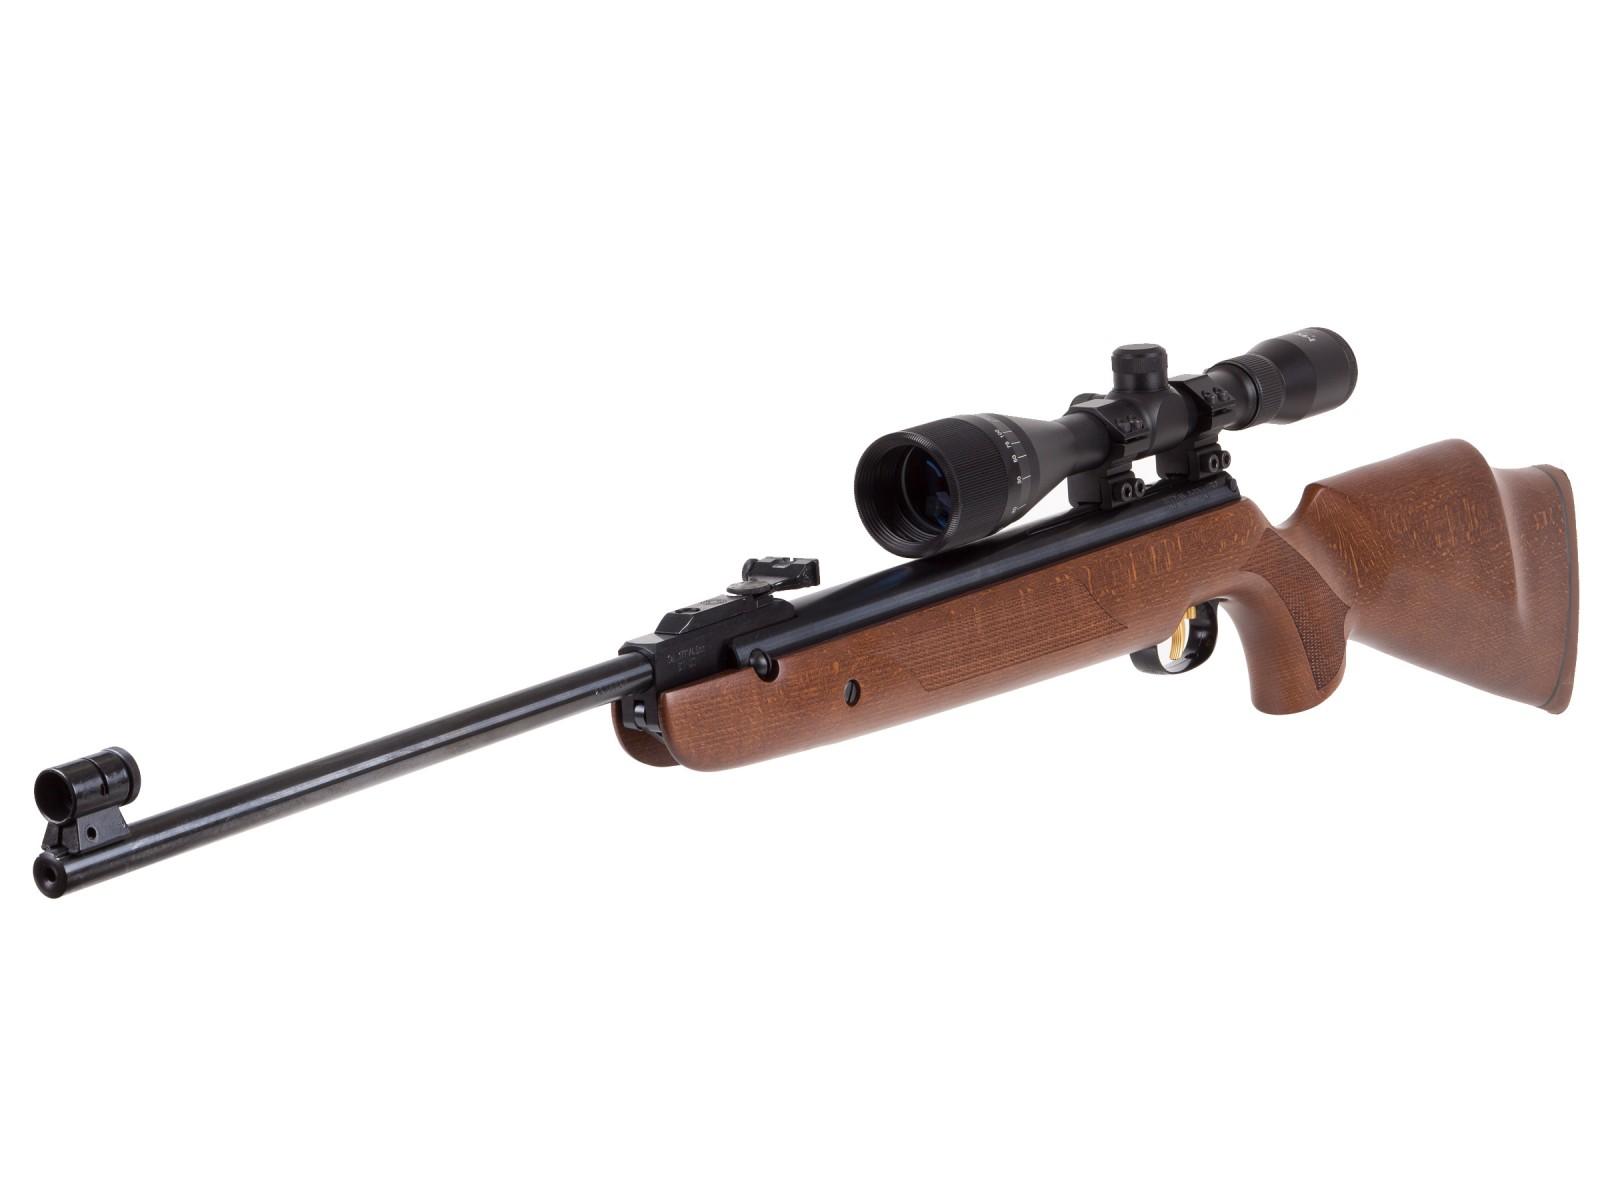 0.22 cal Beeman P11 air pistol A Beeman Air Pistol